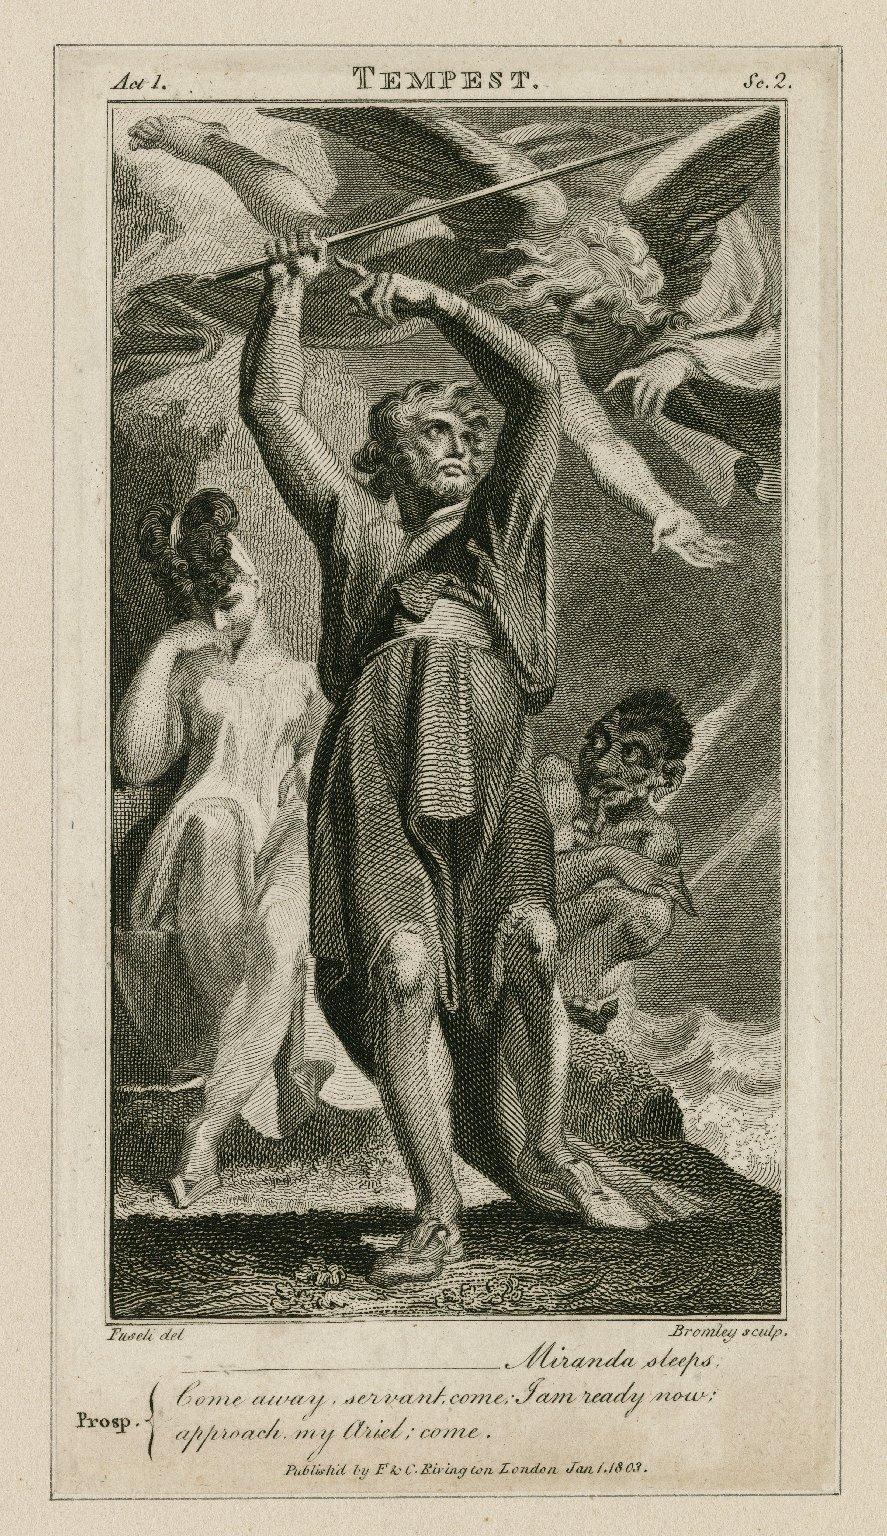 Tempest, act 1, sc. 2, Prosp.: Miranda sleeps; come away, servant come; ... [graphic] / [Henry] Fuseli, del. ; [William] Bromley, sculp.